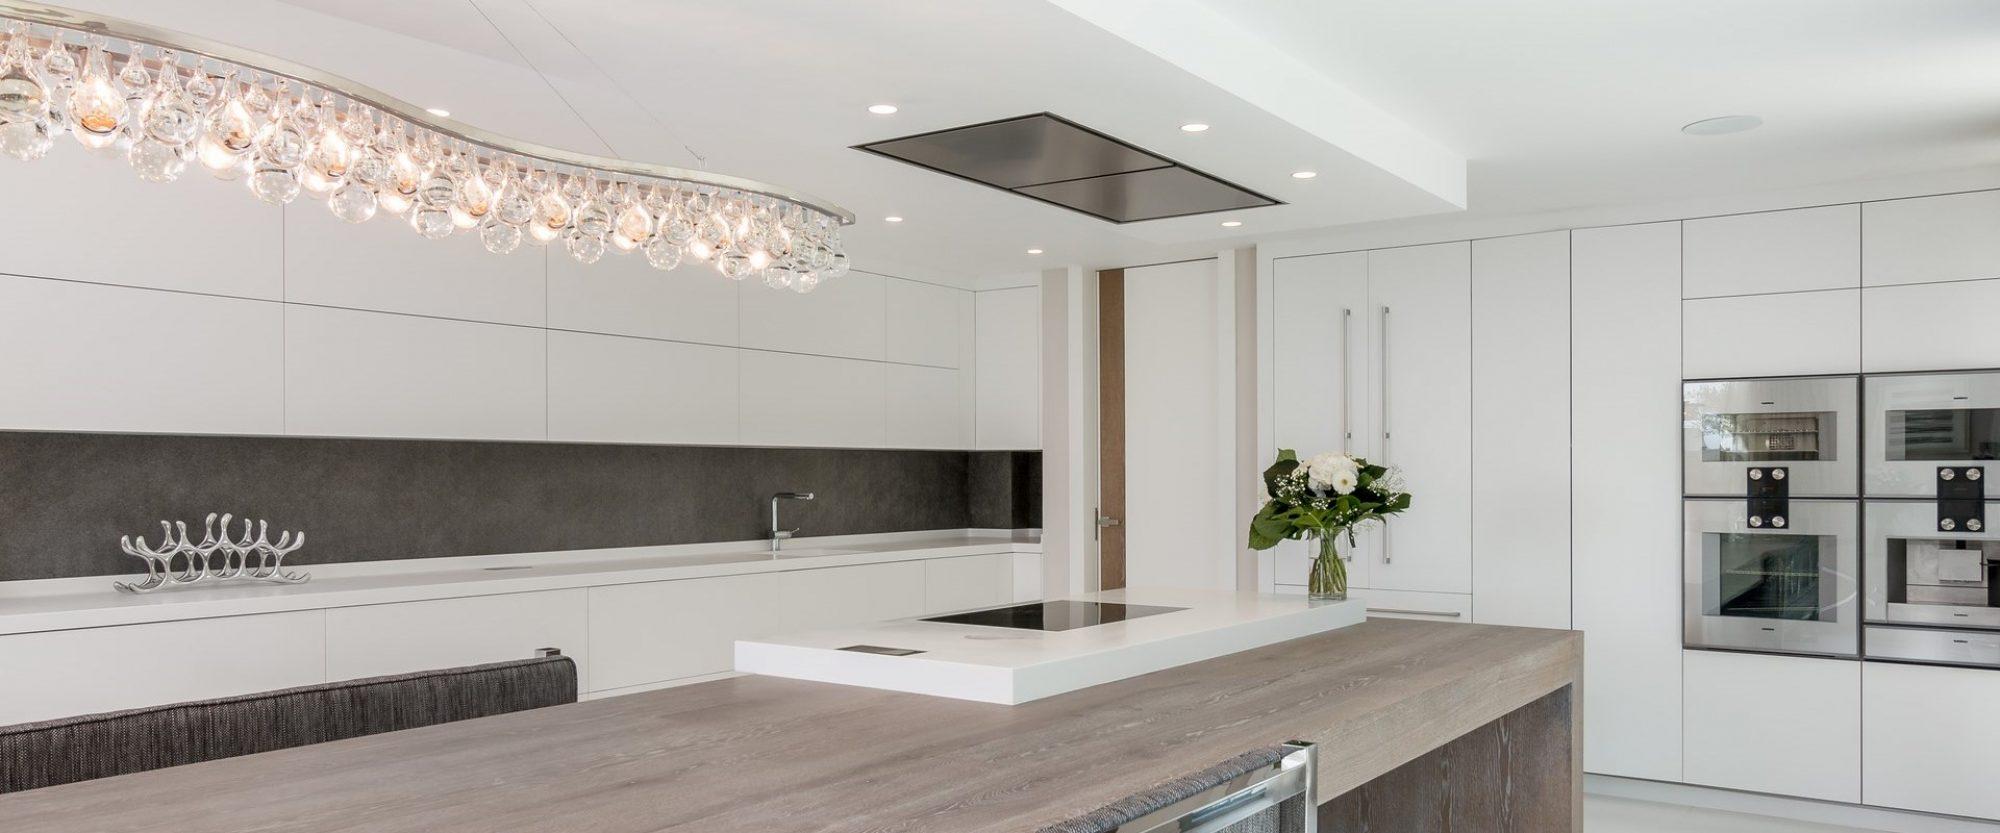 40 m2 professional kitchen